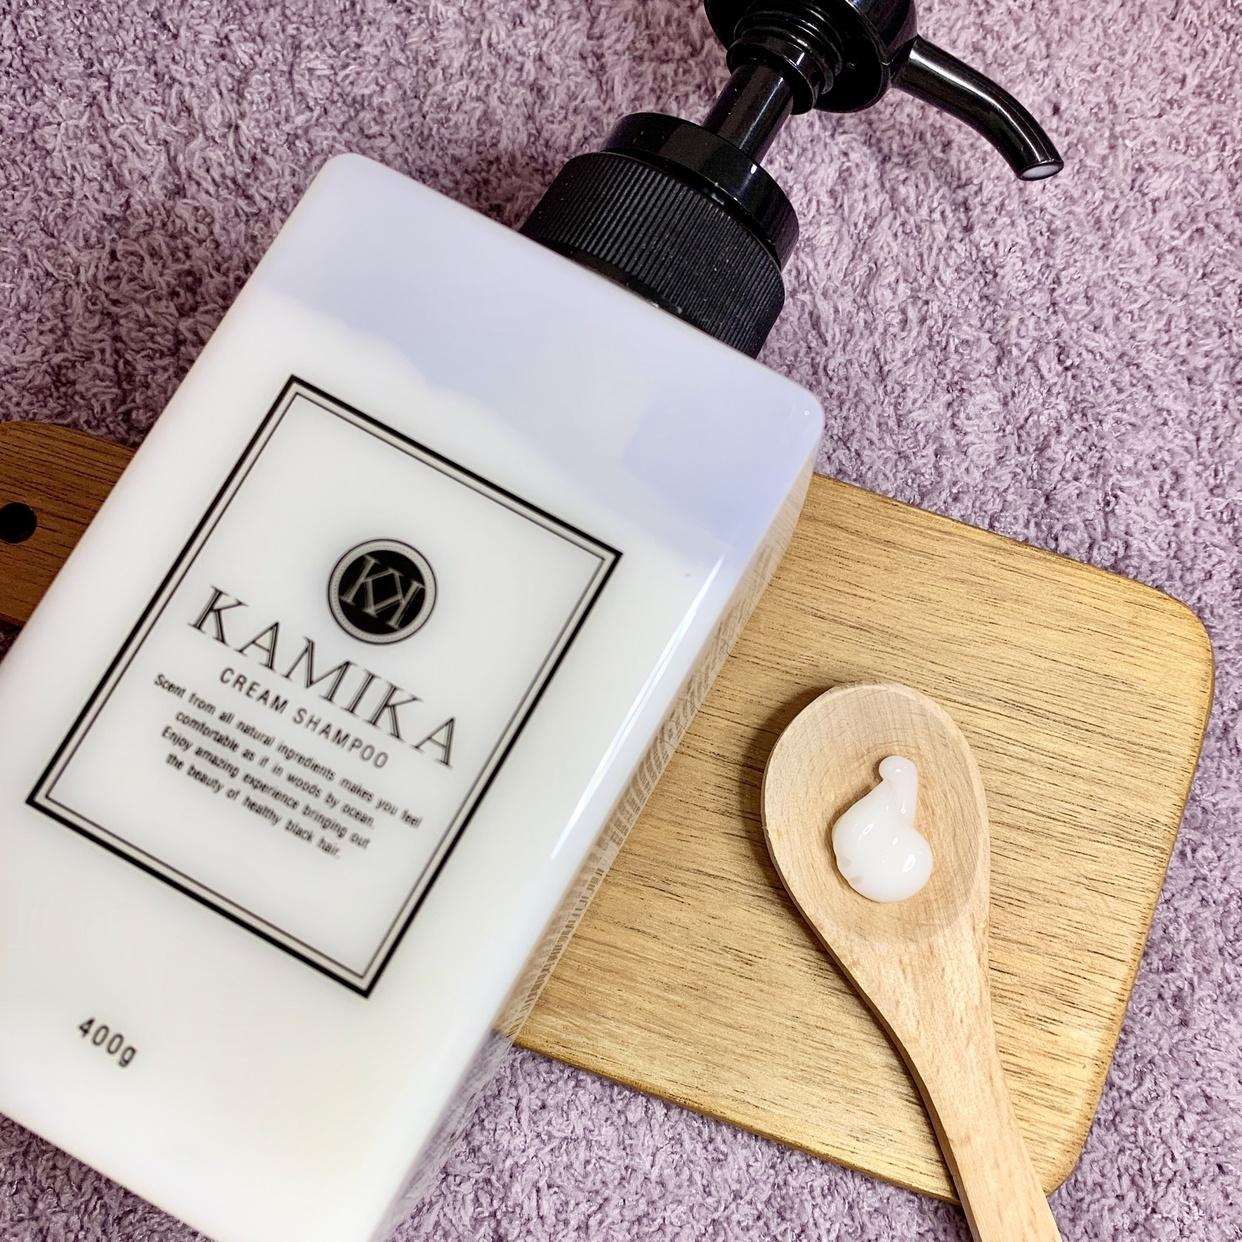 KAMIKA(カミカ) オールインワン黒髪クリームシャンプーを使ったうりむー姉さんさんのクチコミ画像